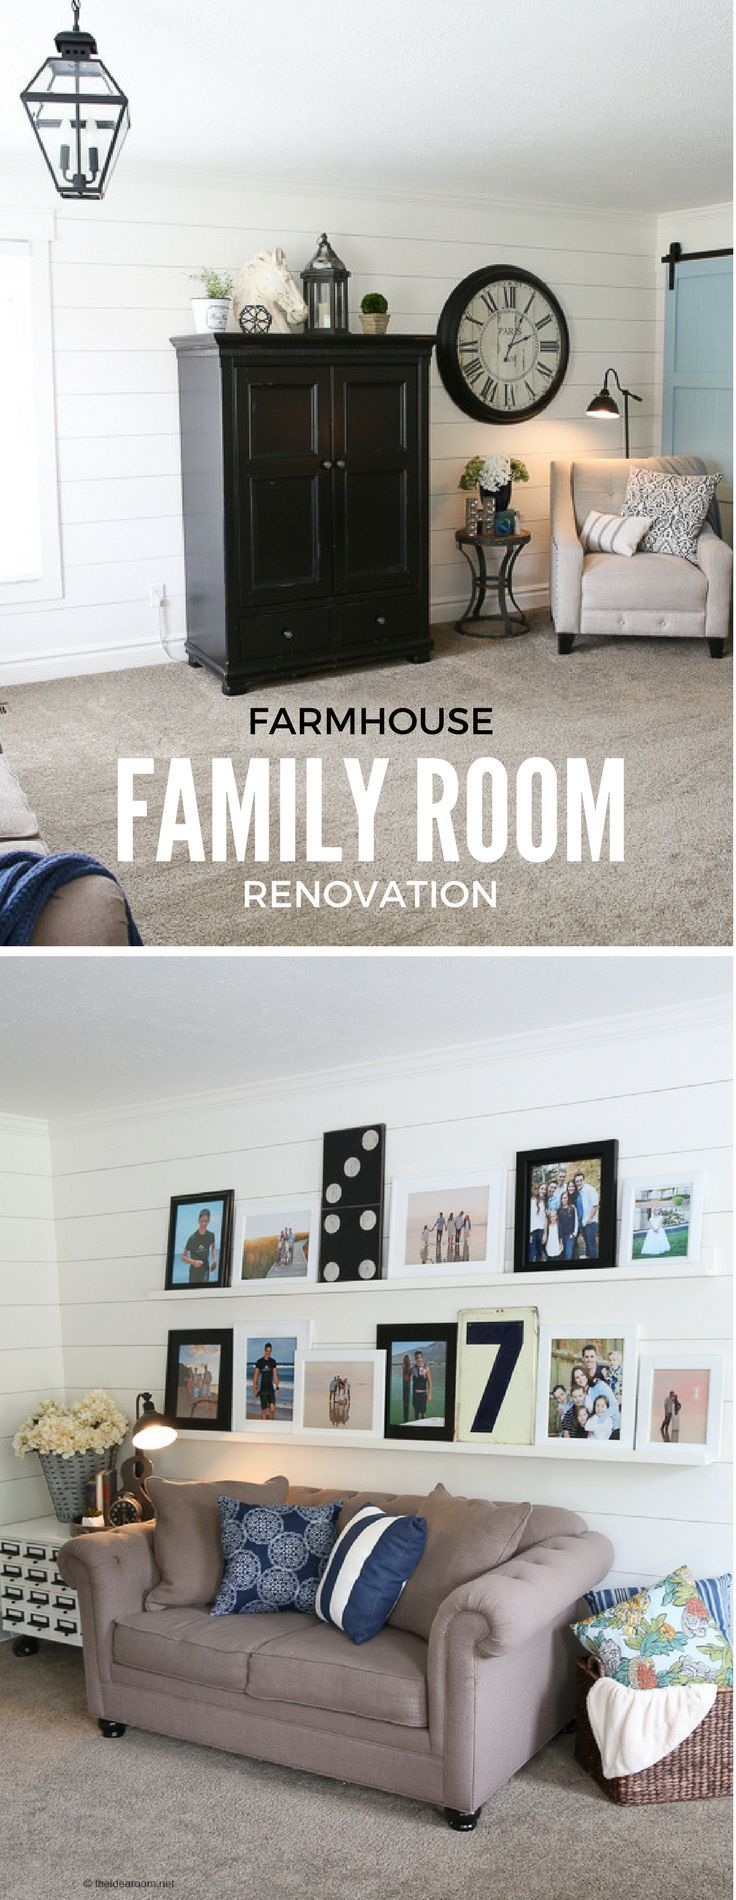 50 best family room ideas images on pinterest